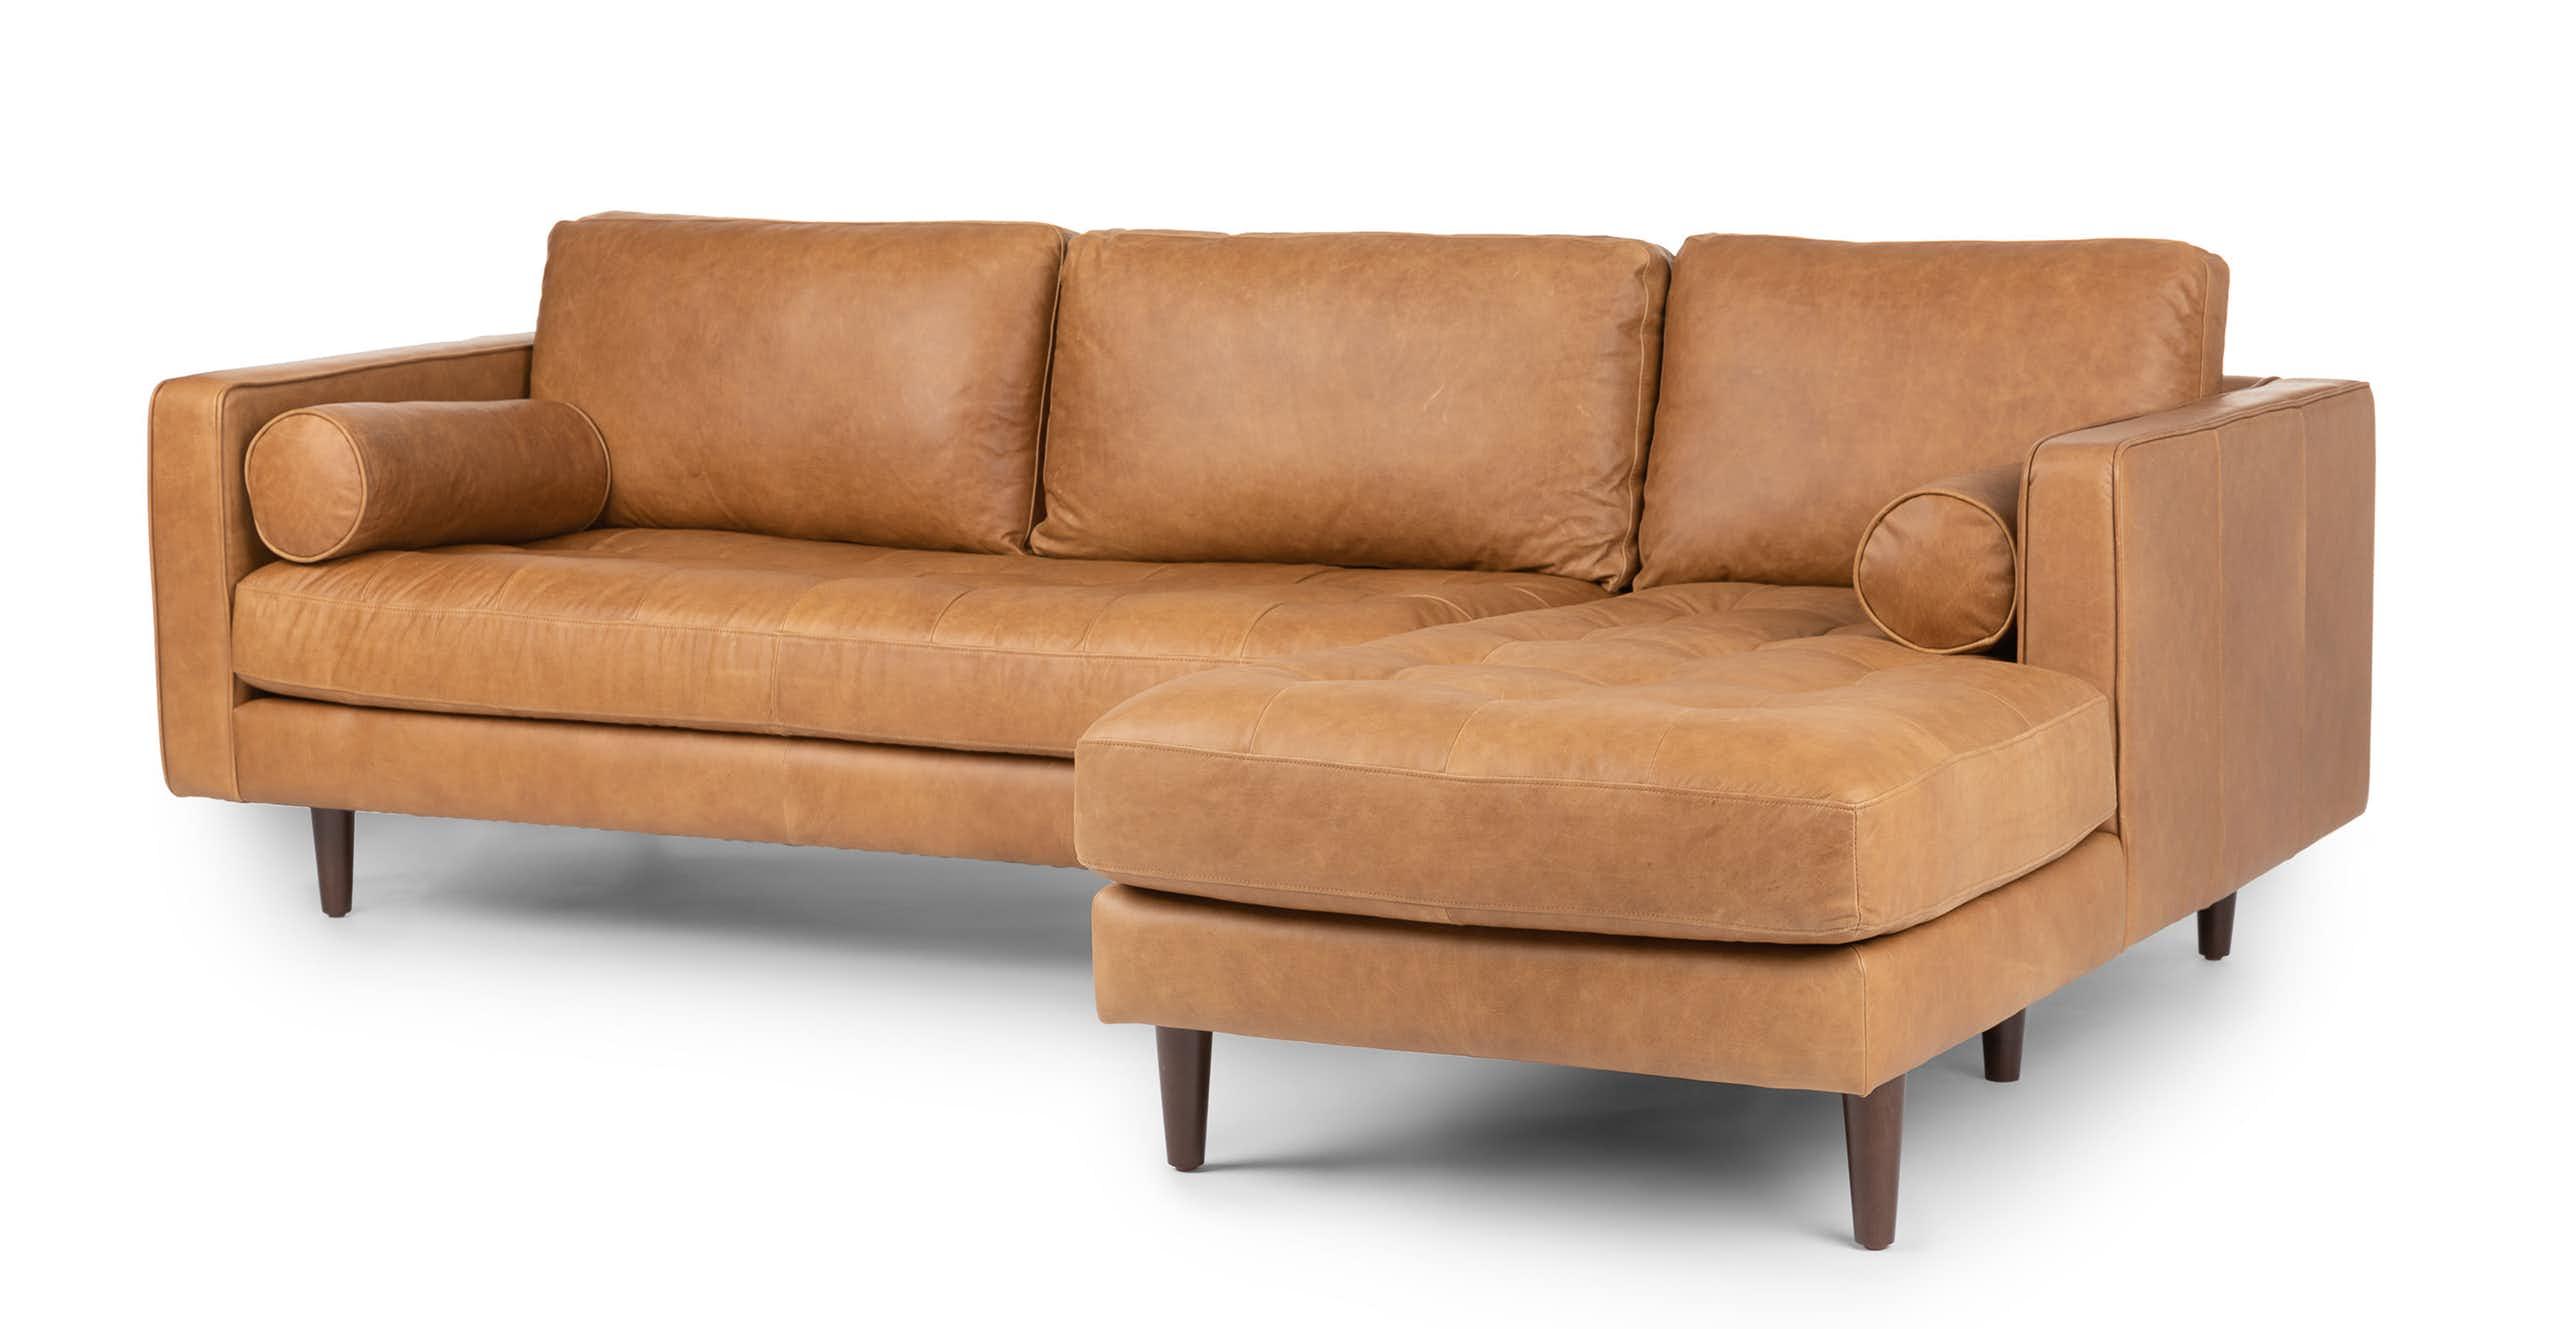 Sven Right Sectional Sofa, Charme Tan